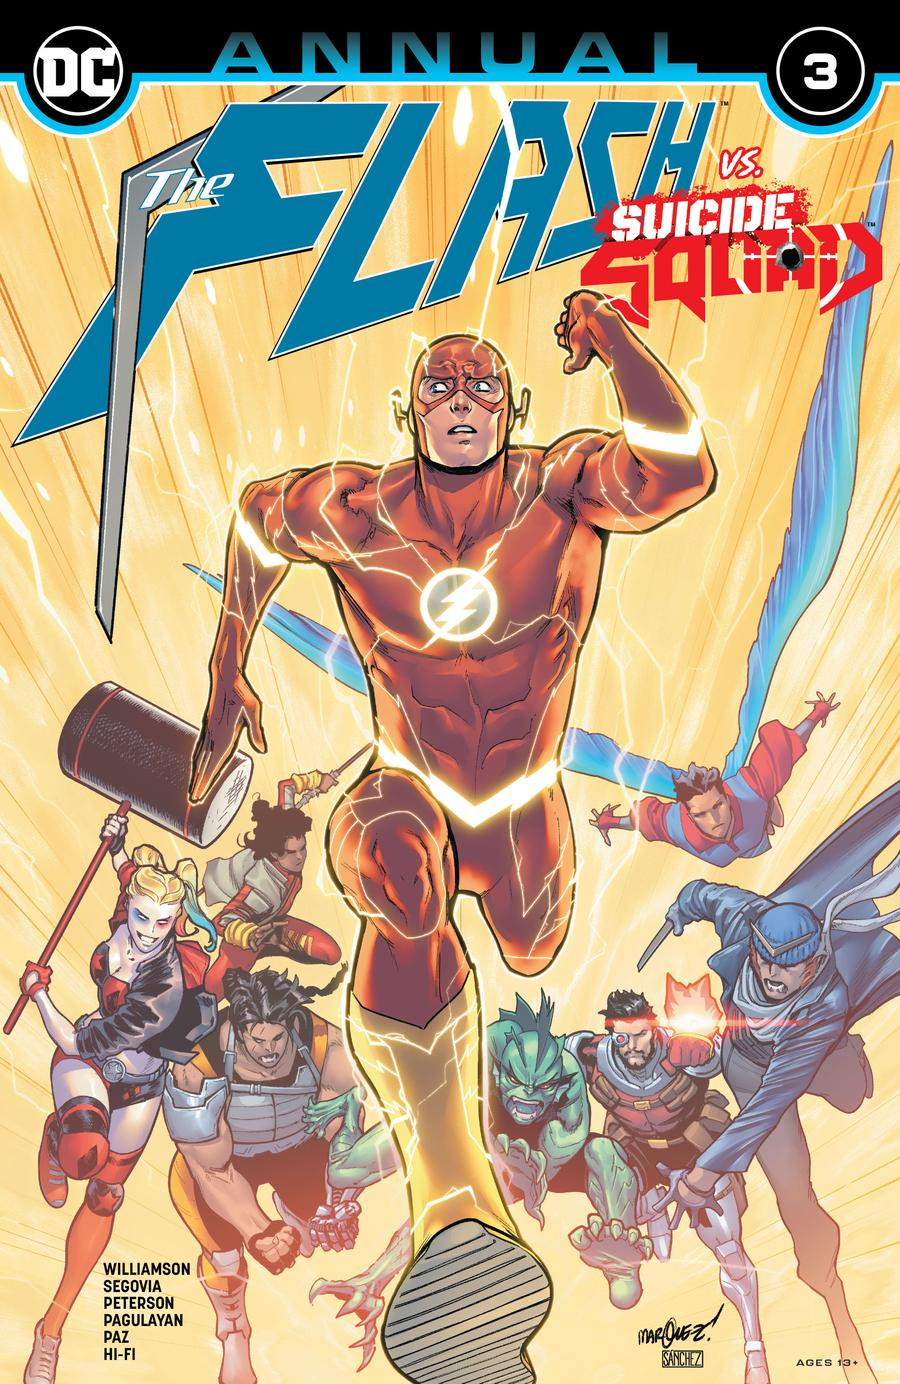 Flash Vol 5 Annual #3